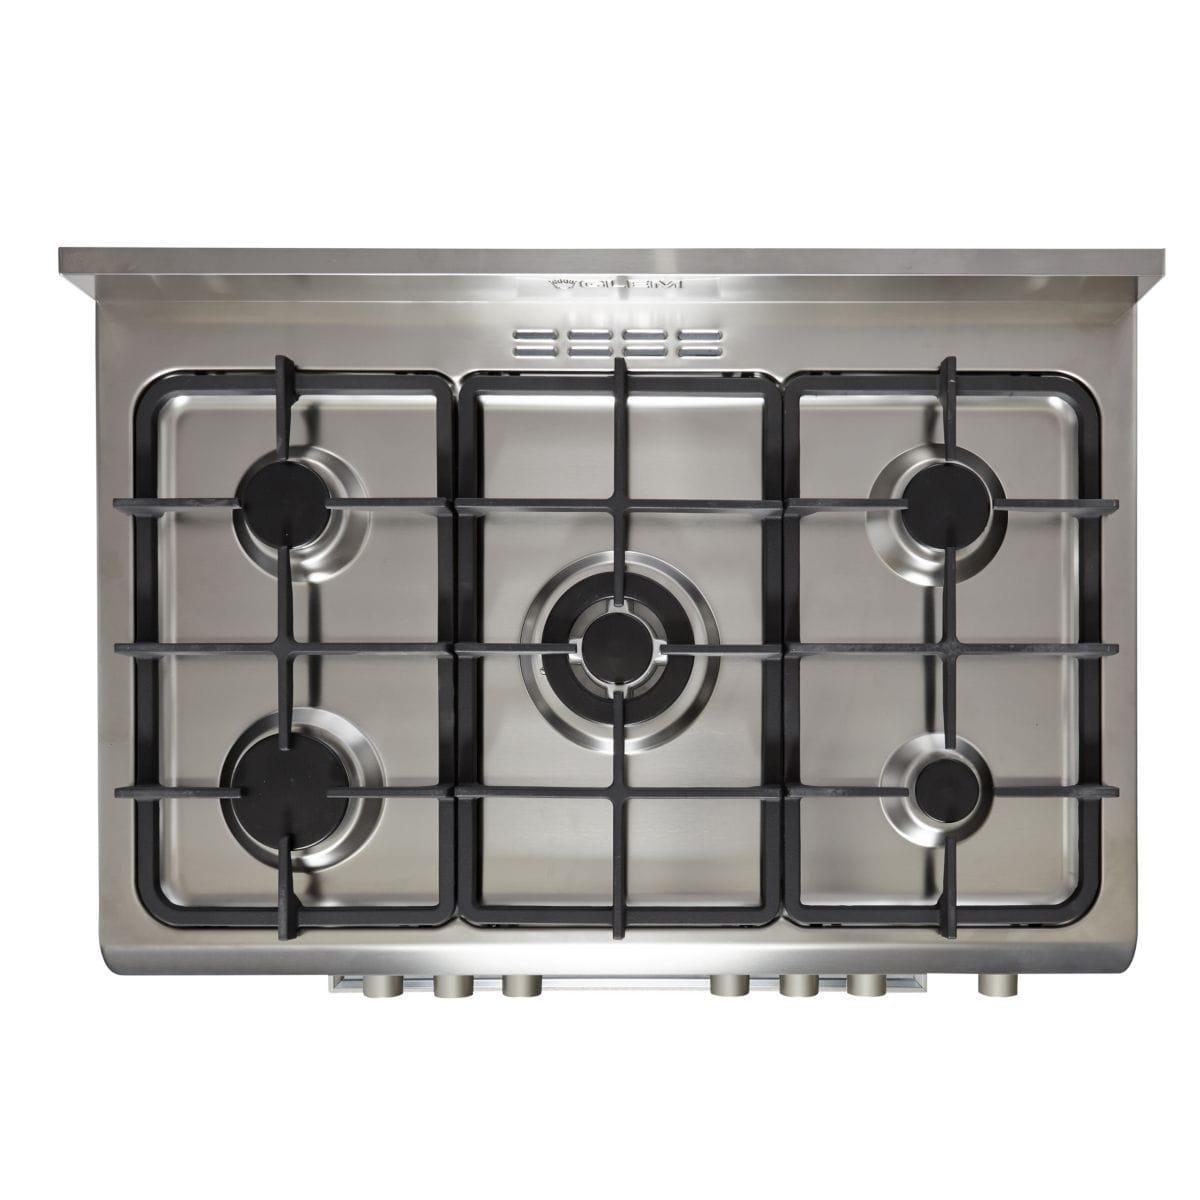 Piano de cuisson gaz GLEM GE960CMIX